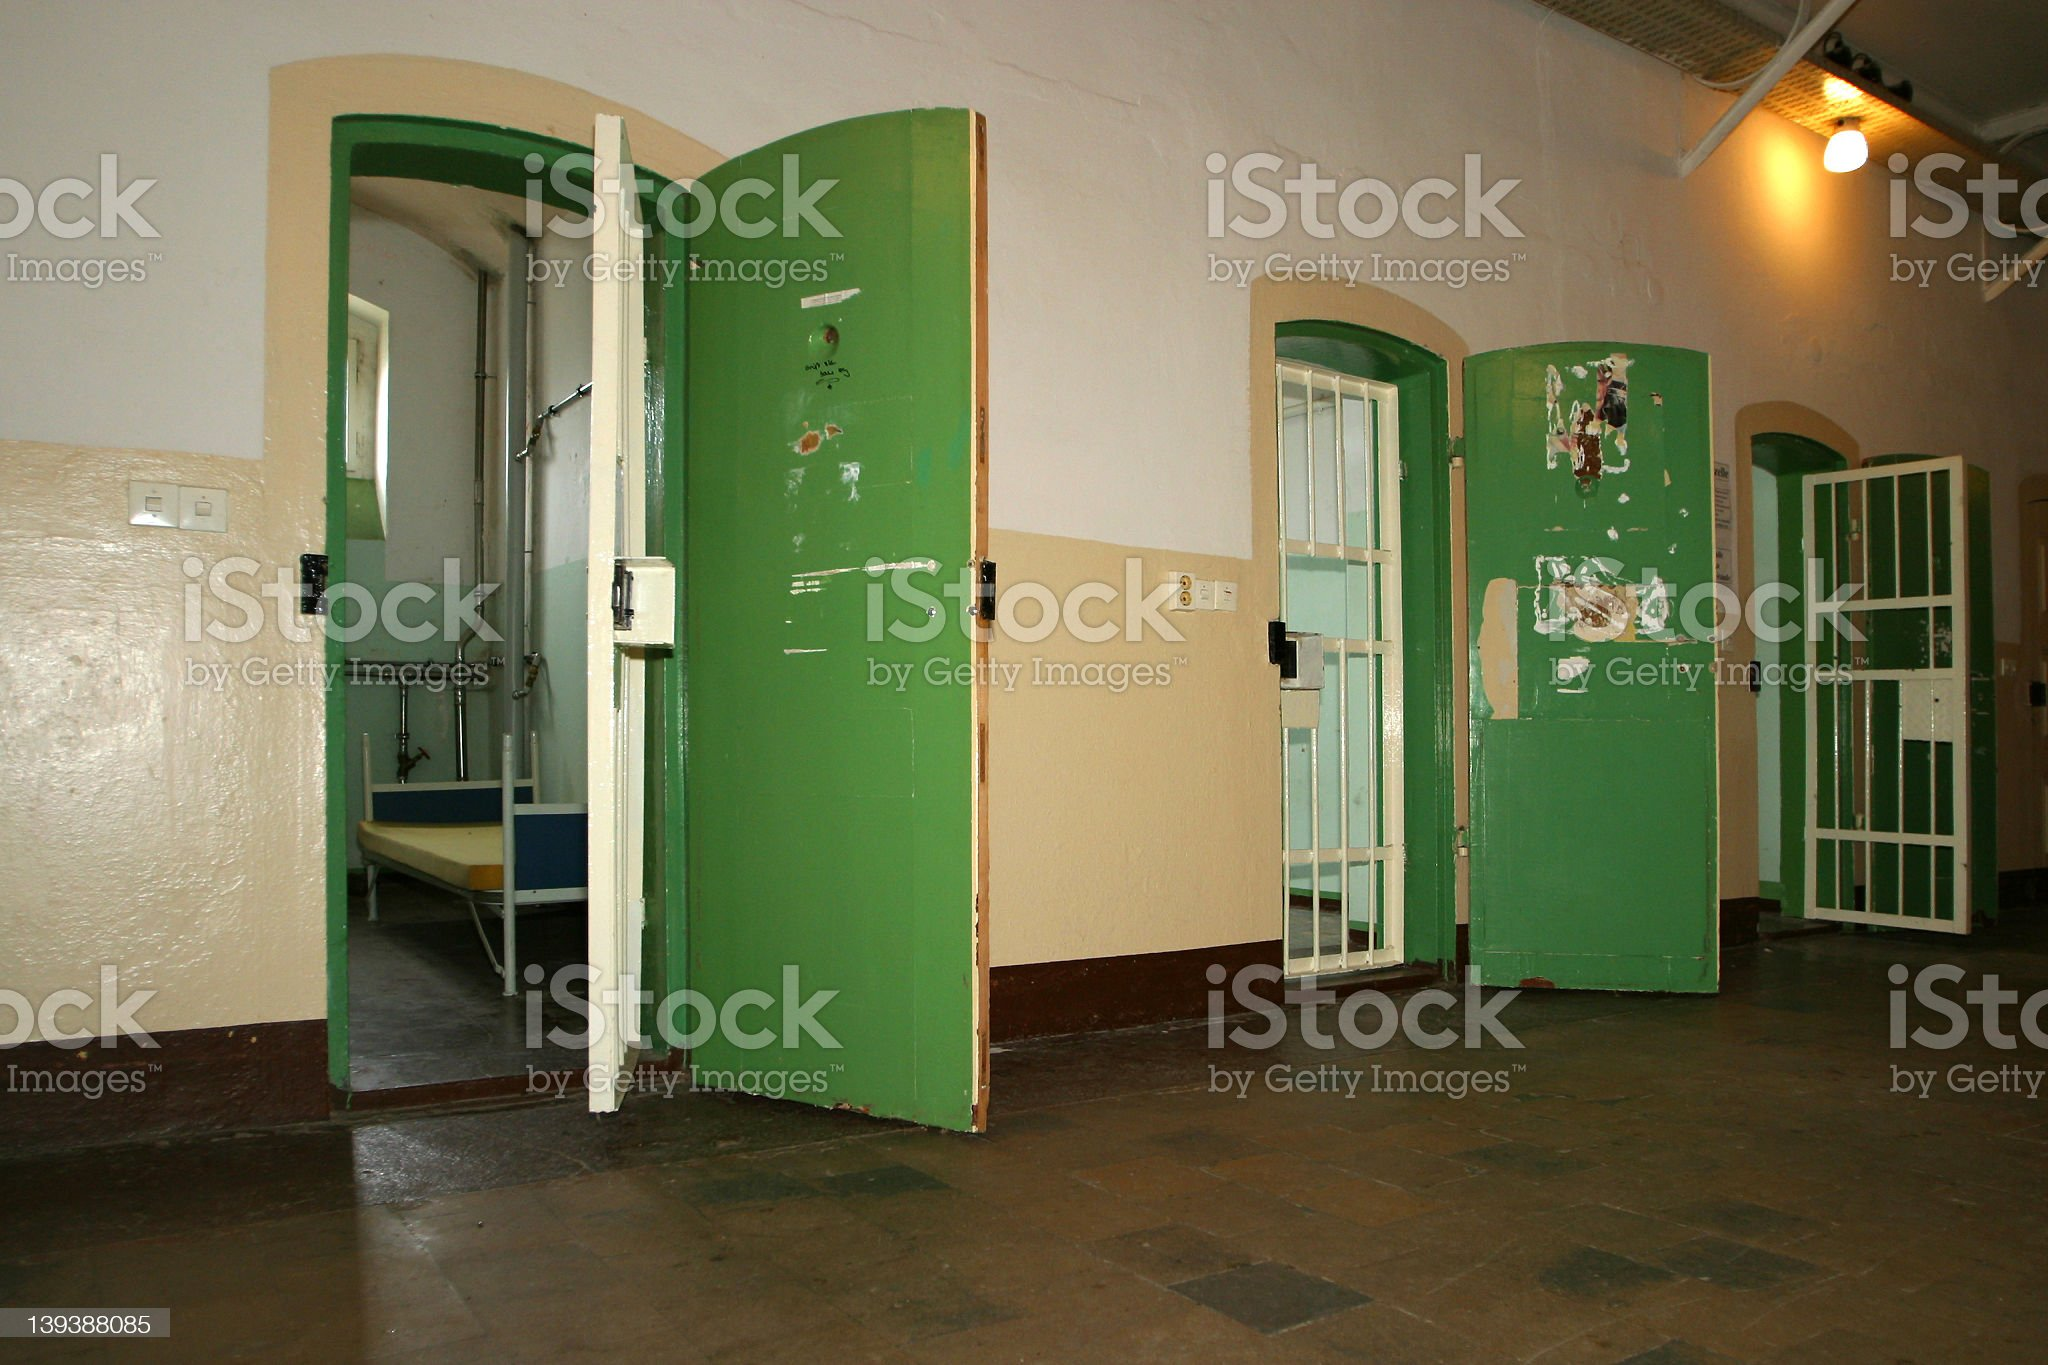 Woman prison cell 3 royalty-free stock photo